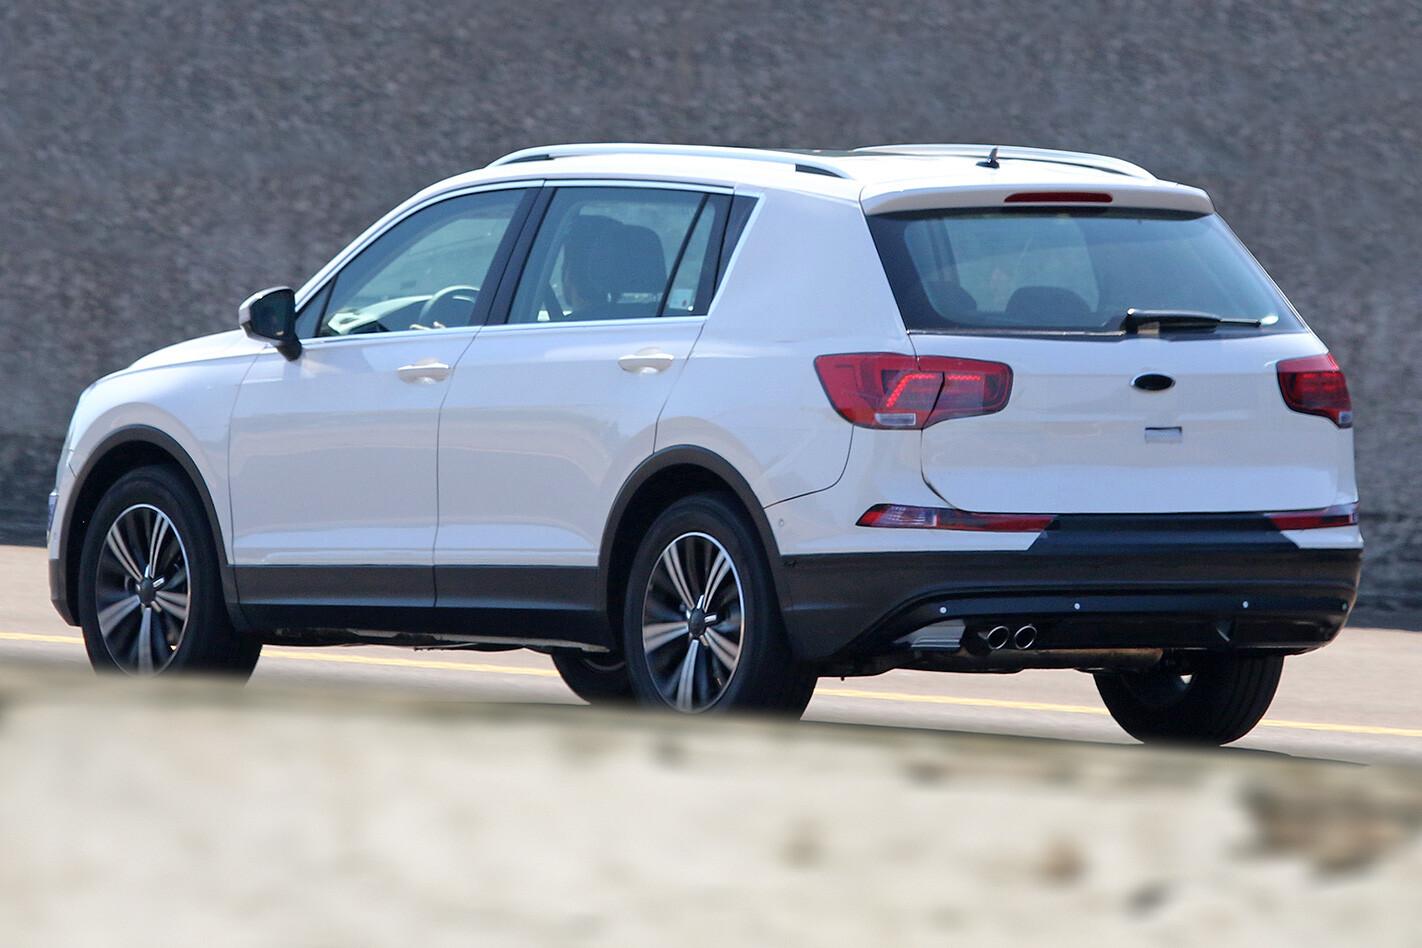 Volkswagen Tiguan Allspace Rear Side Jpg